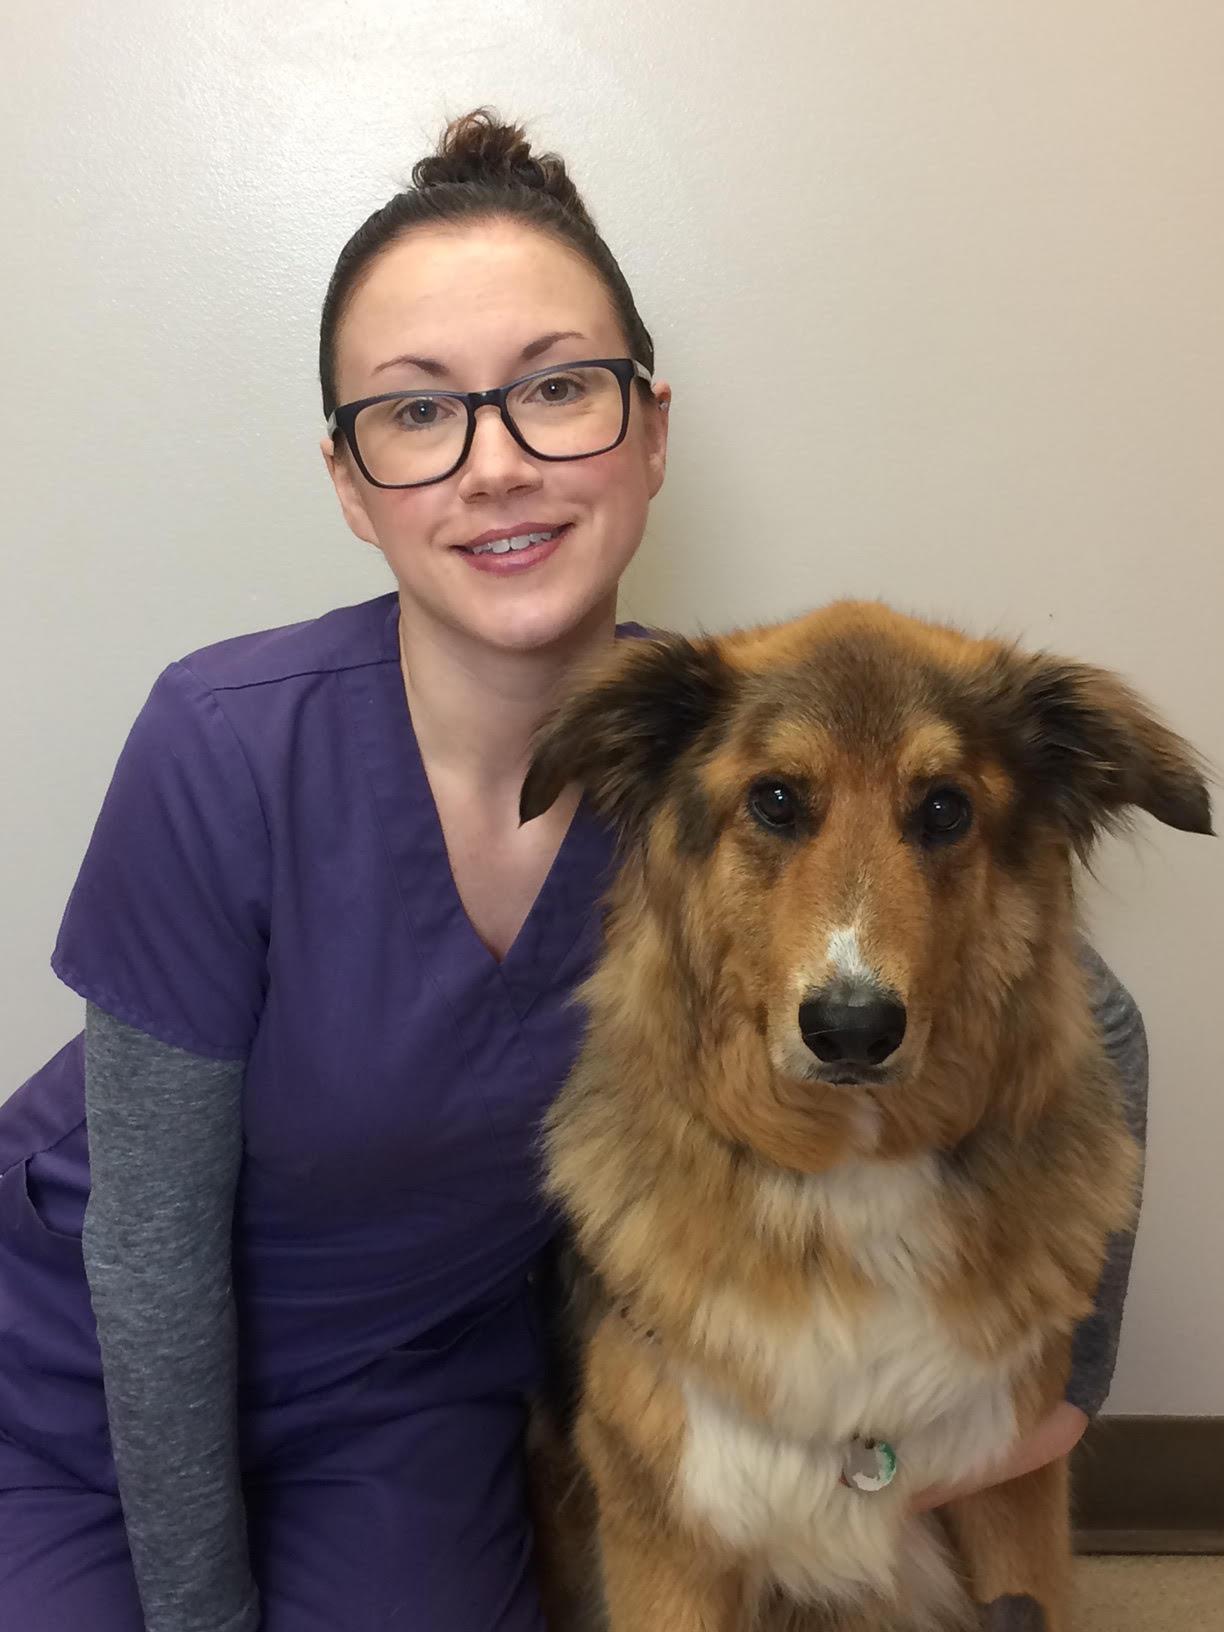 Mallory, Registered Veterinary Technician